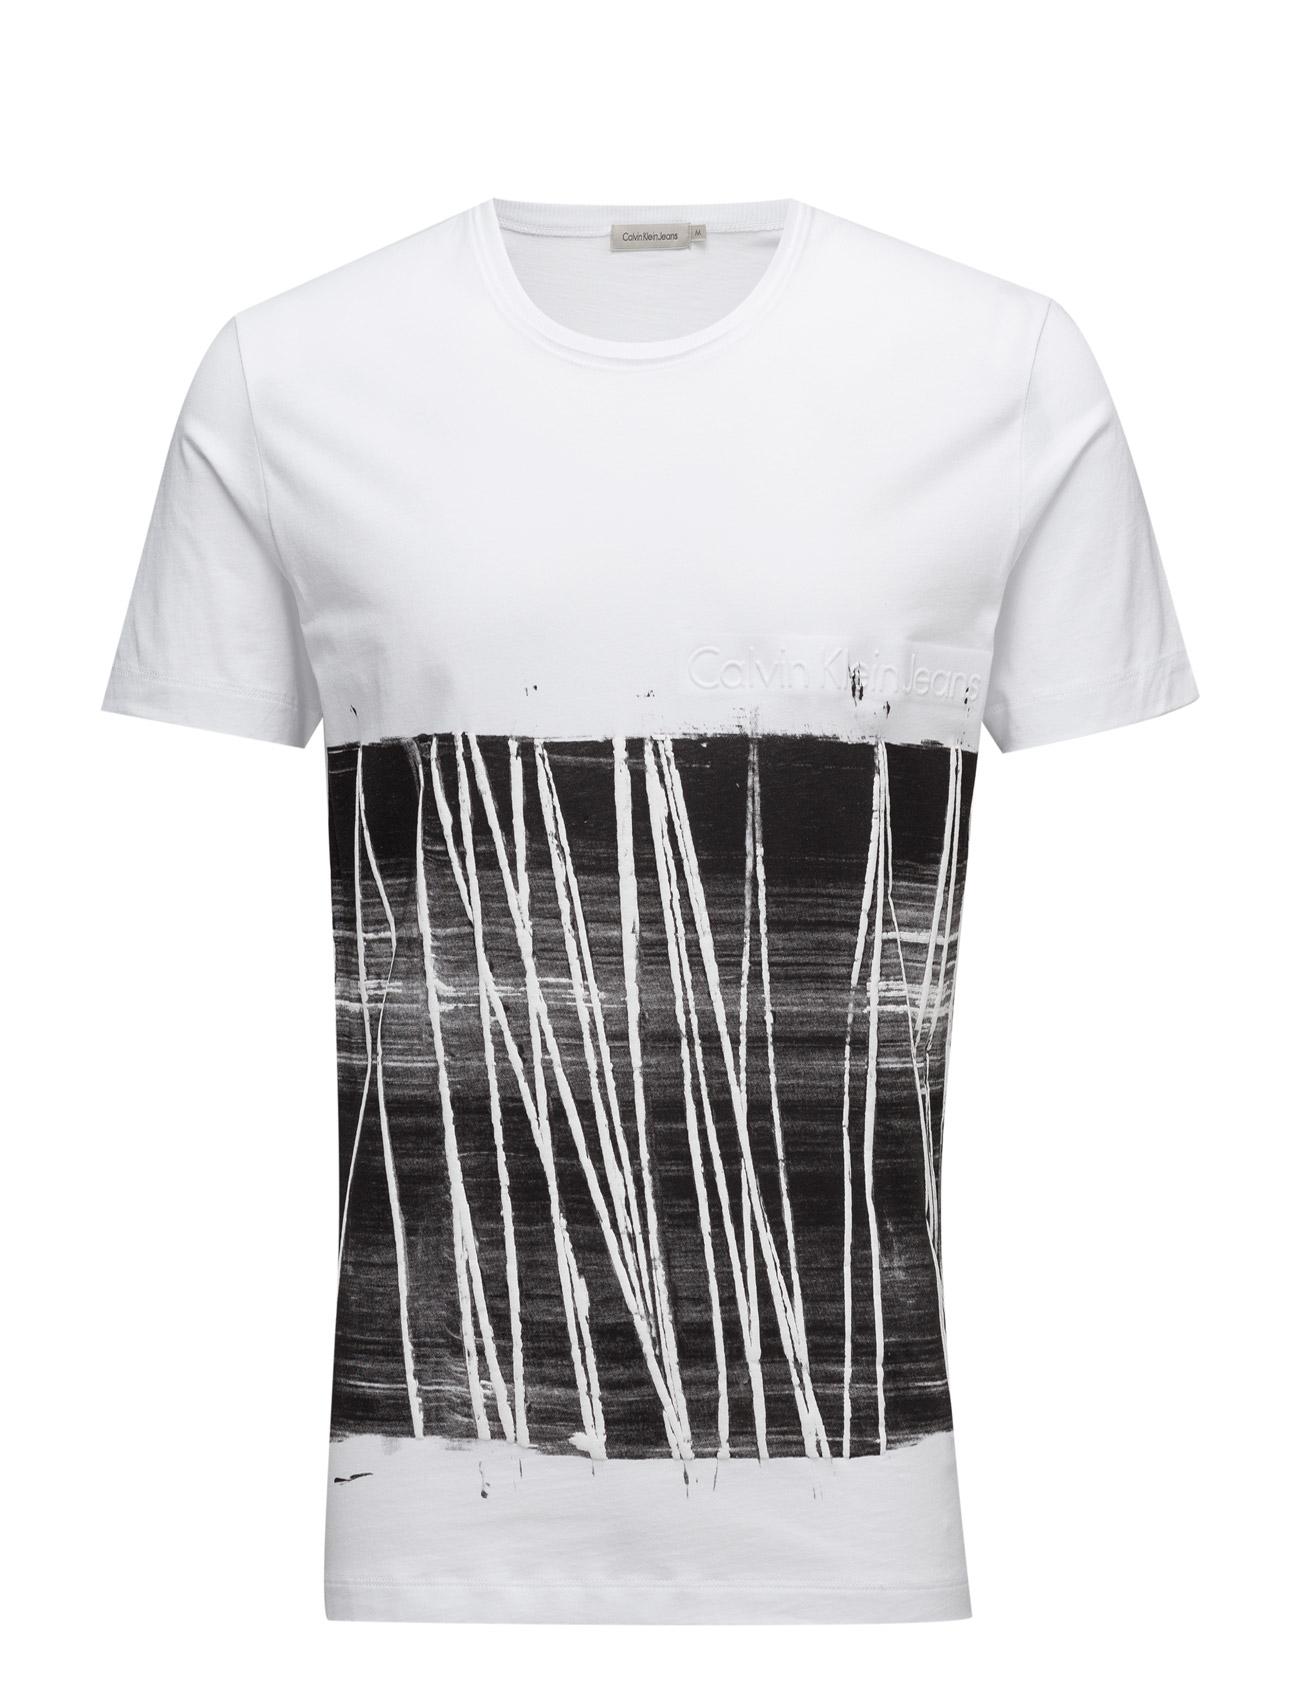 Tionah Cn Tee S/S Calvin Klein Jeans Kortærmet